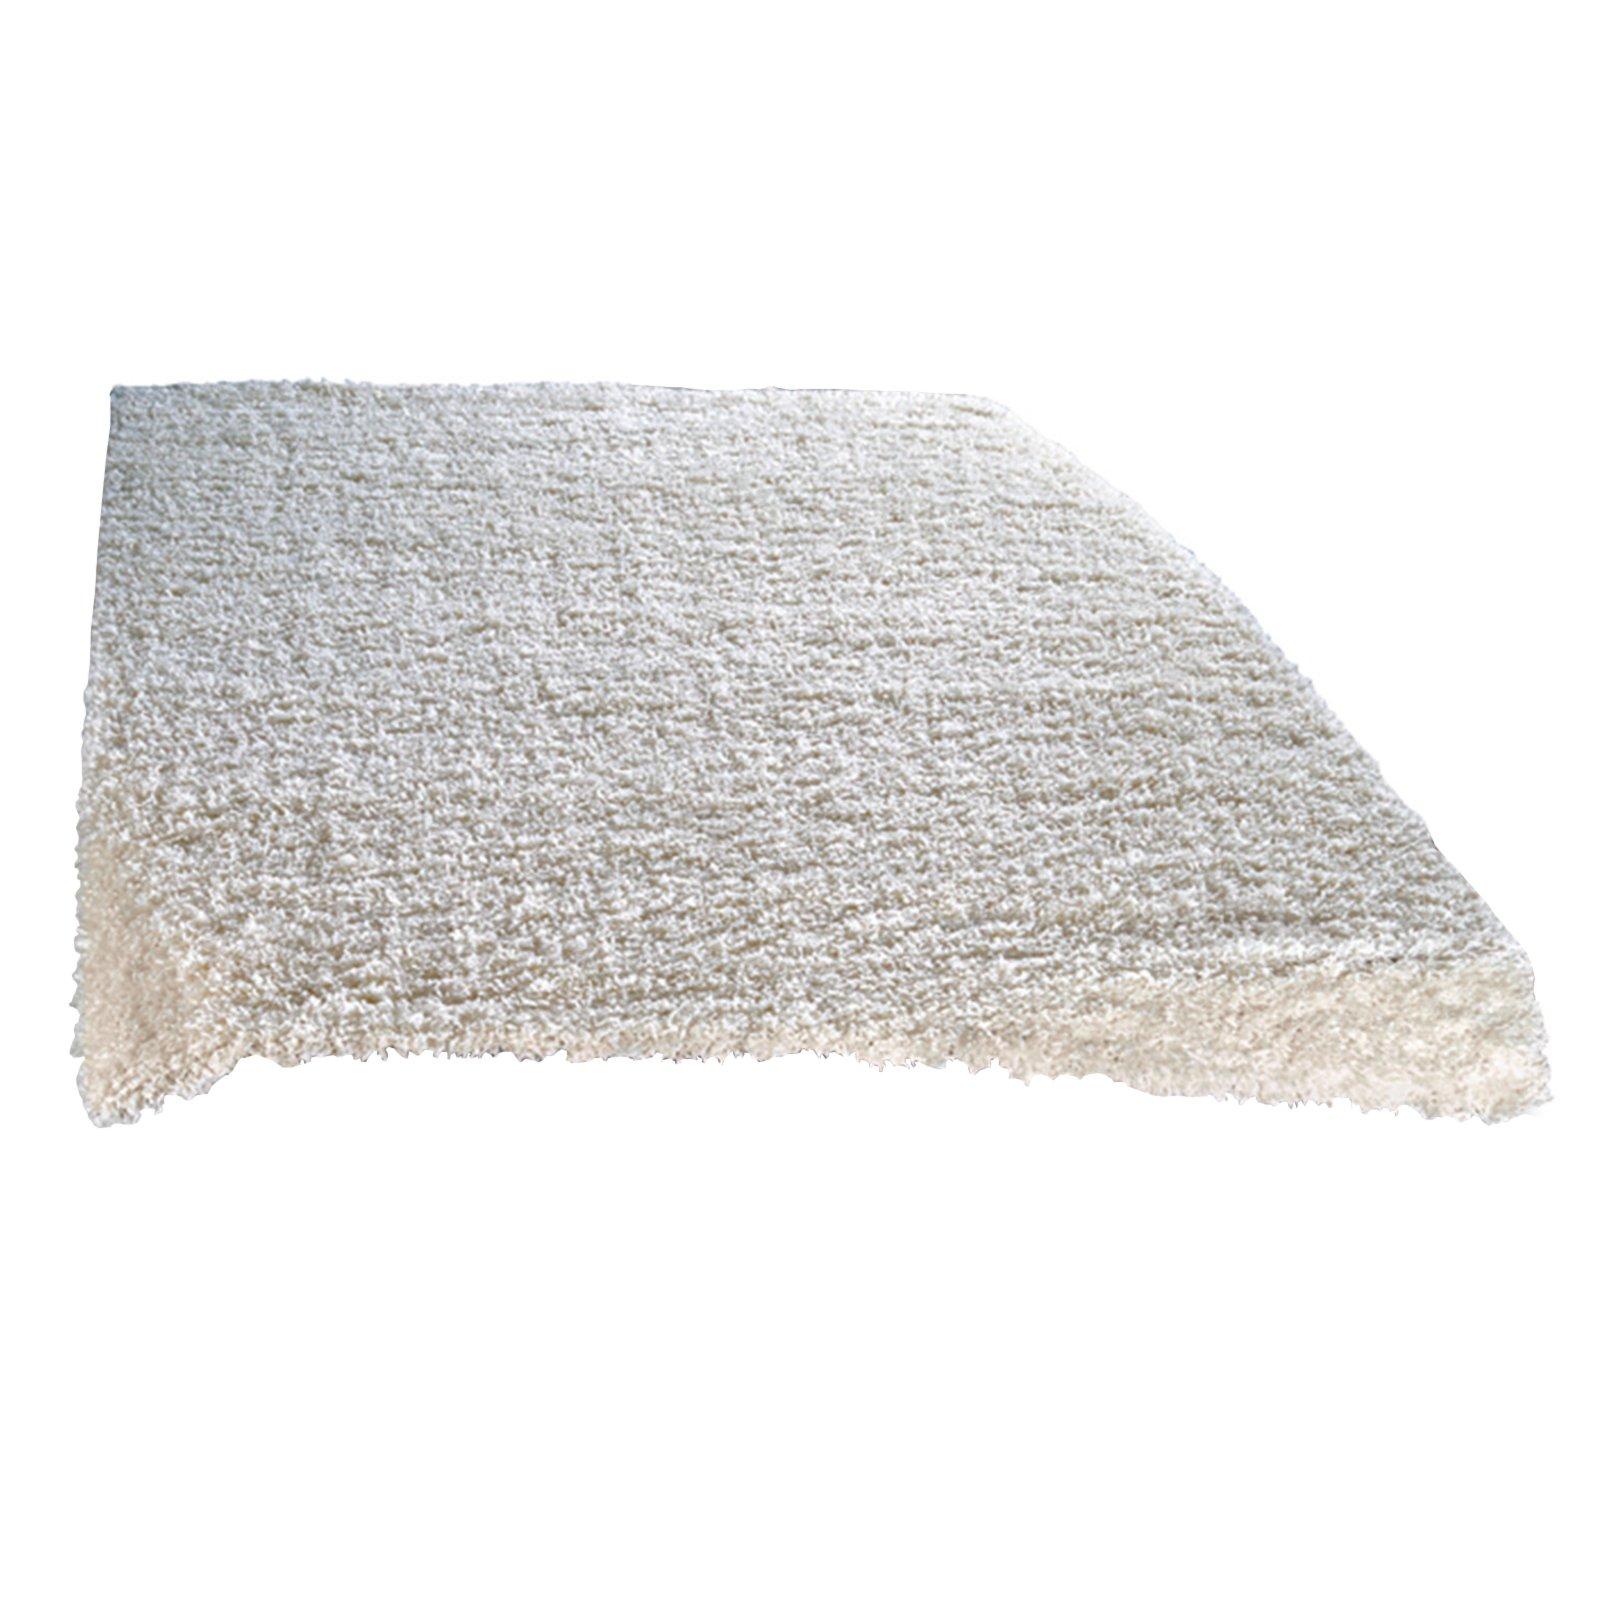 Hochflor-Teppich SHAGGY PLUS - weiß - 40x60 cm